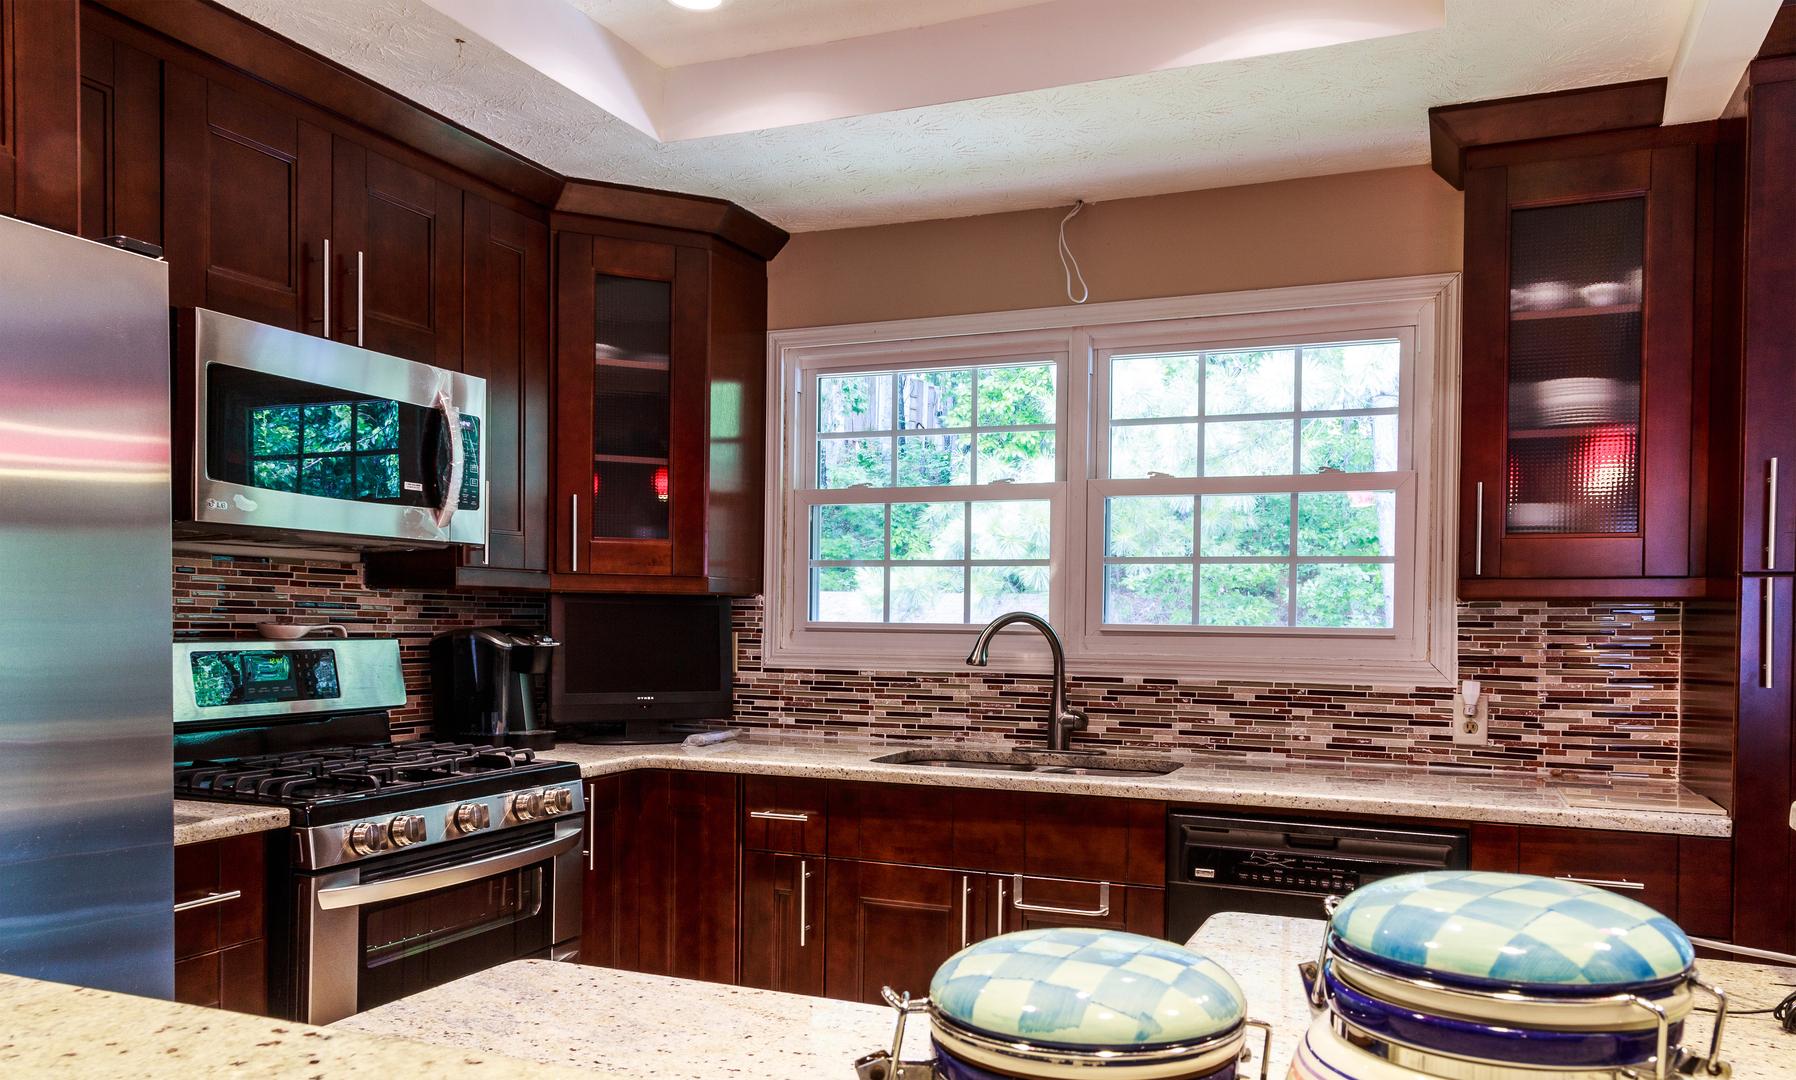 Xanadu Decor Dream Kitchen designs Cabinets Counter Tops